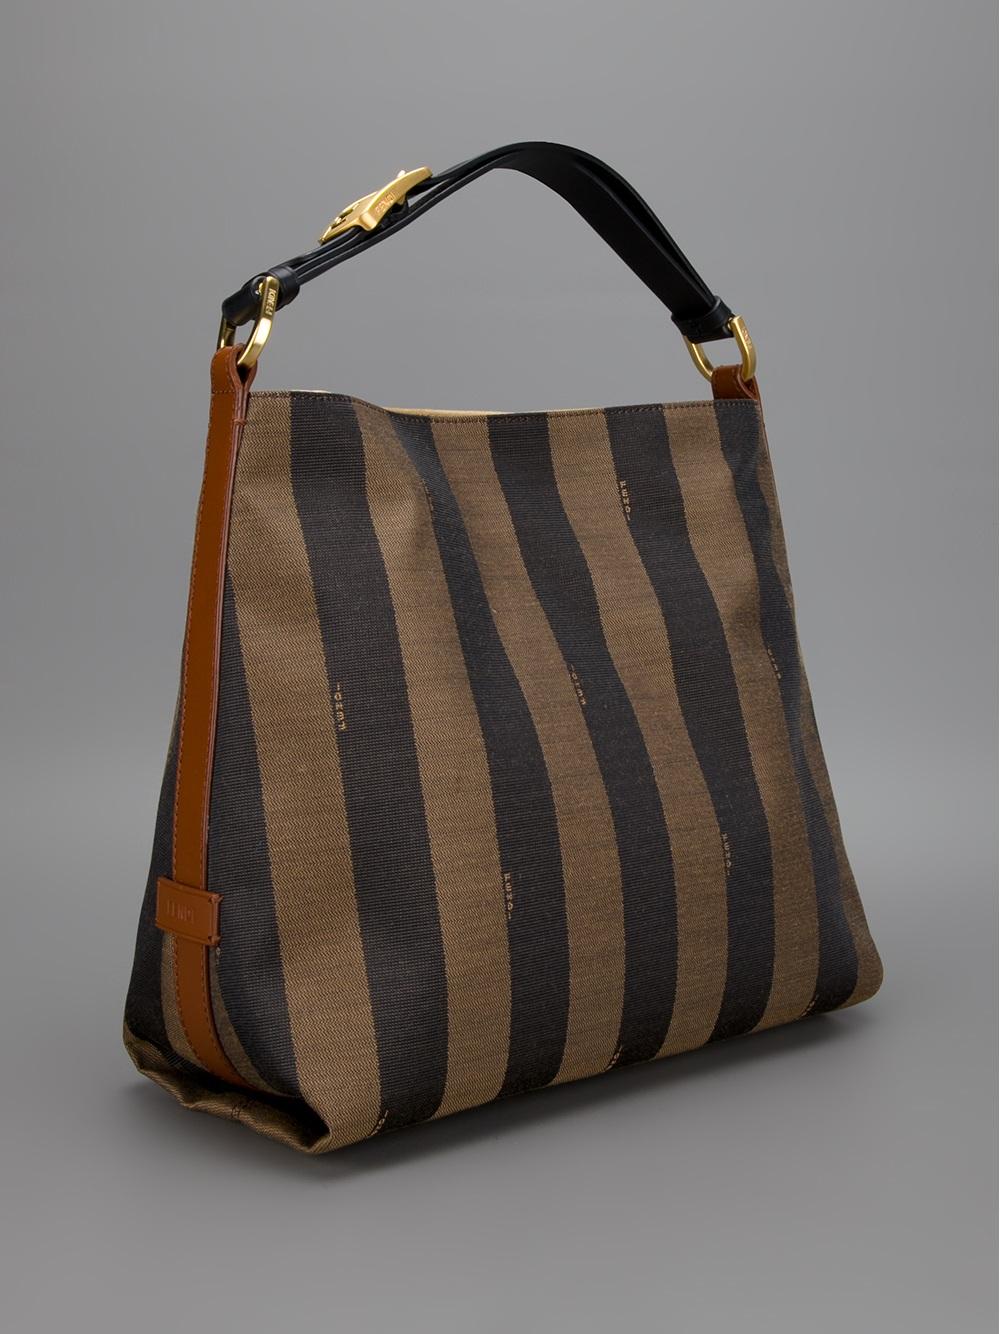 6faf0b4dbaad ... italy lyst fendi striped tote in brown 92da4 6c238